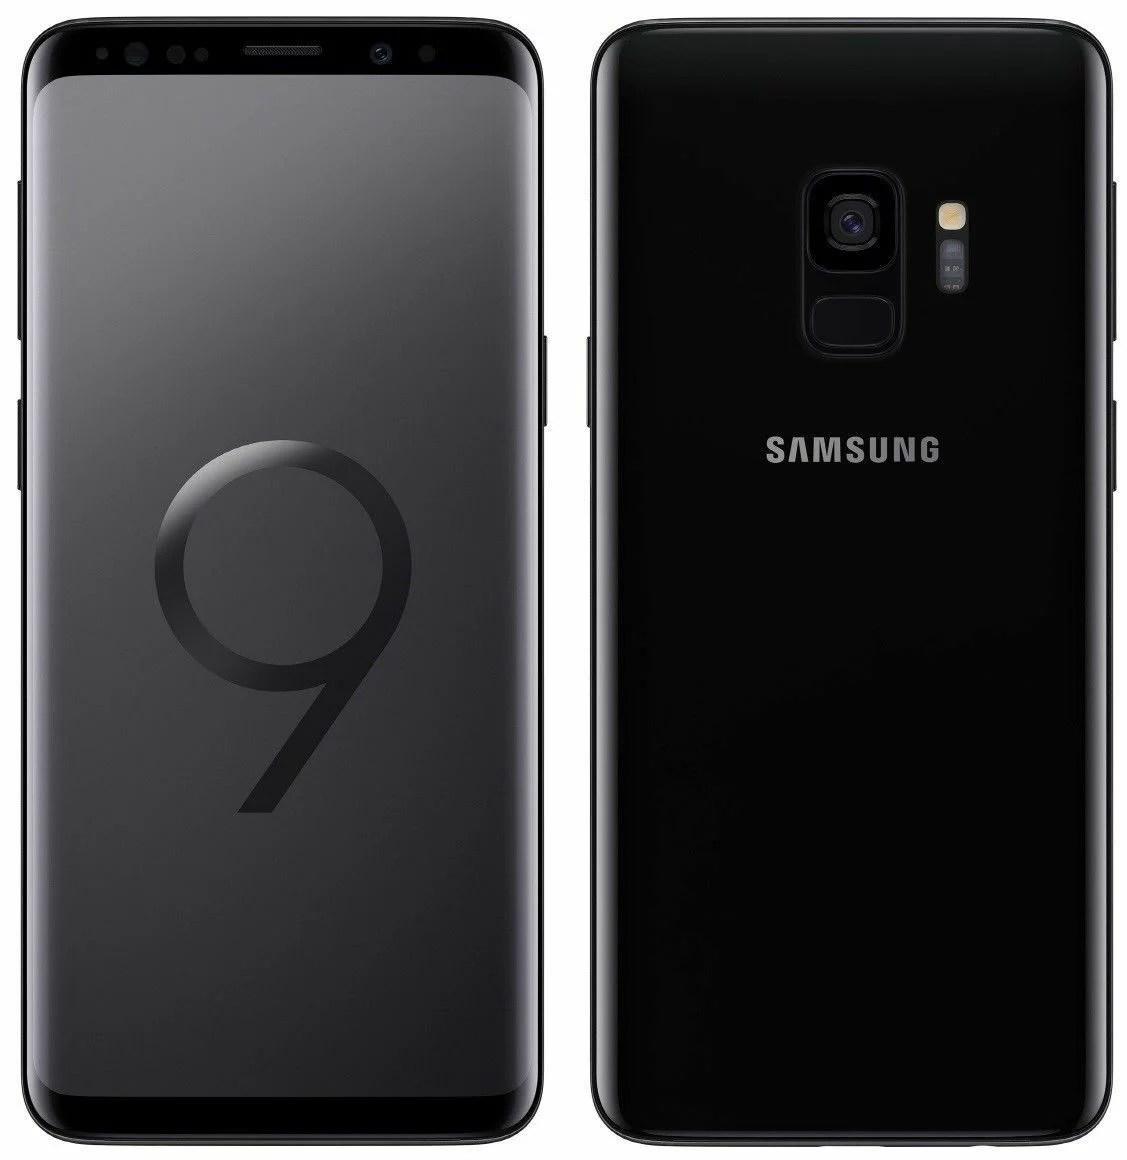 Samsung Galaxy S9 Sm G960f Ds 64gb Dual Sim Factory Unlocked Midnight Black Sold By Sobeonline1 Rakuten Com Shop